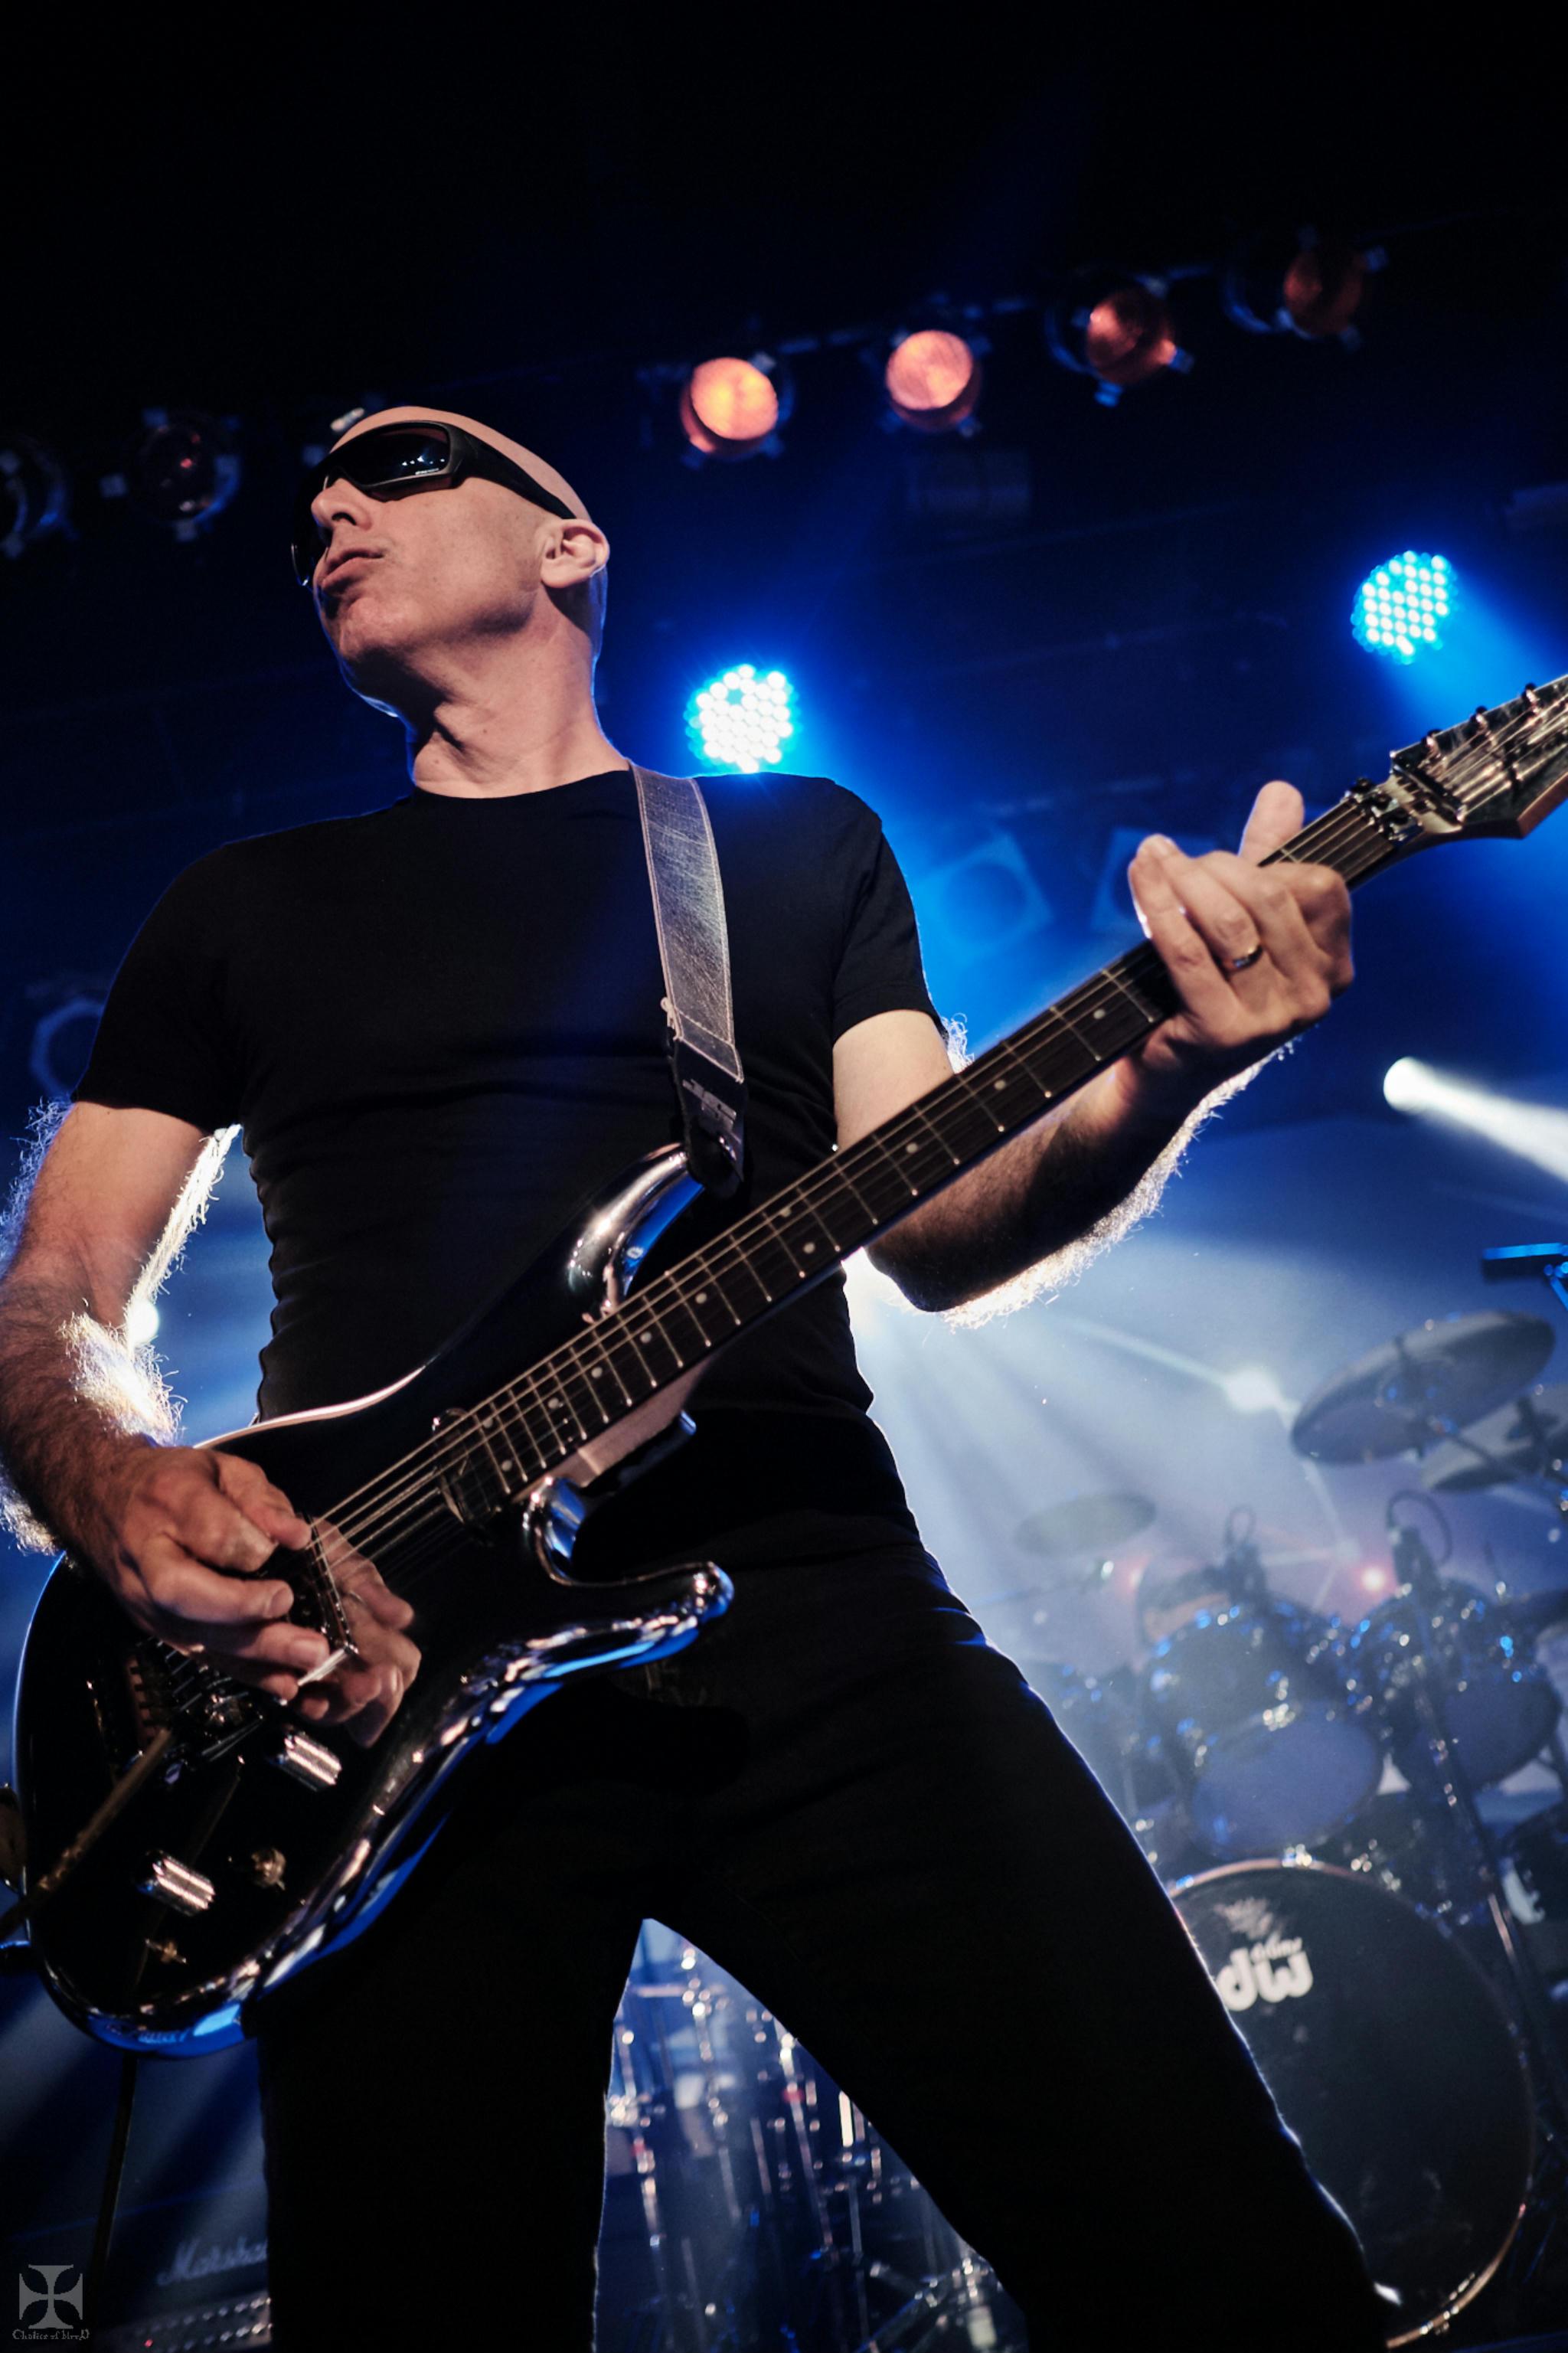 2018.12.04 Joe Satriani - DSC21251_branded.jpg